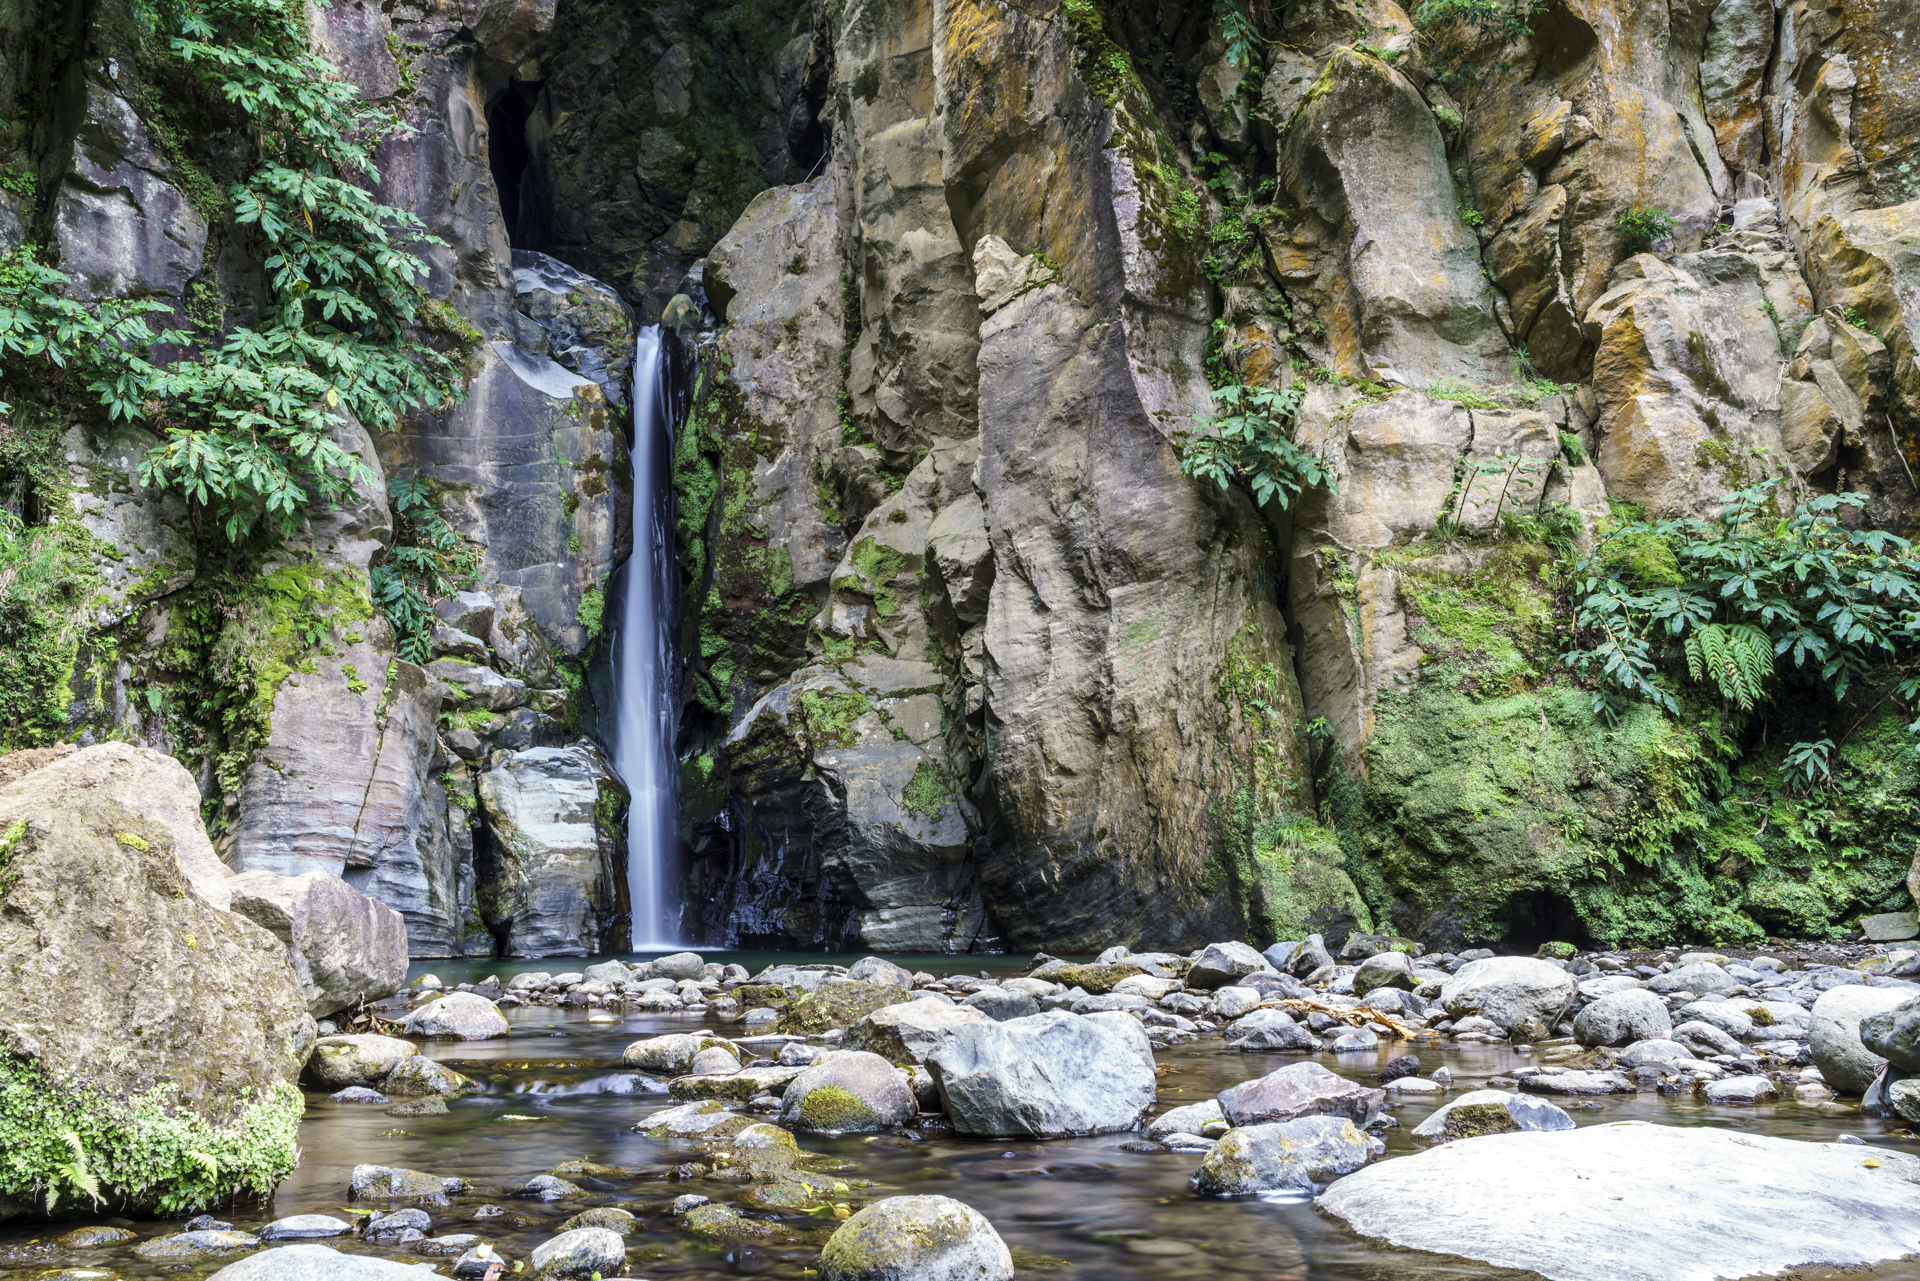 Wasserfall Sao Miguel Azoren